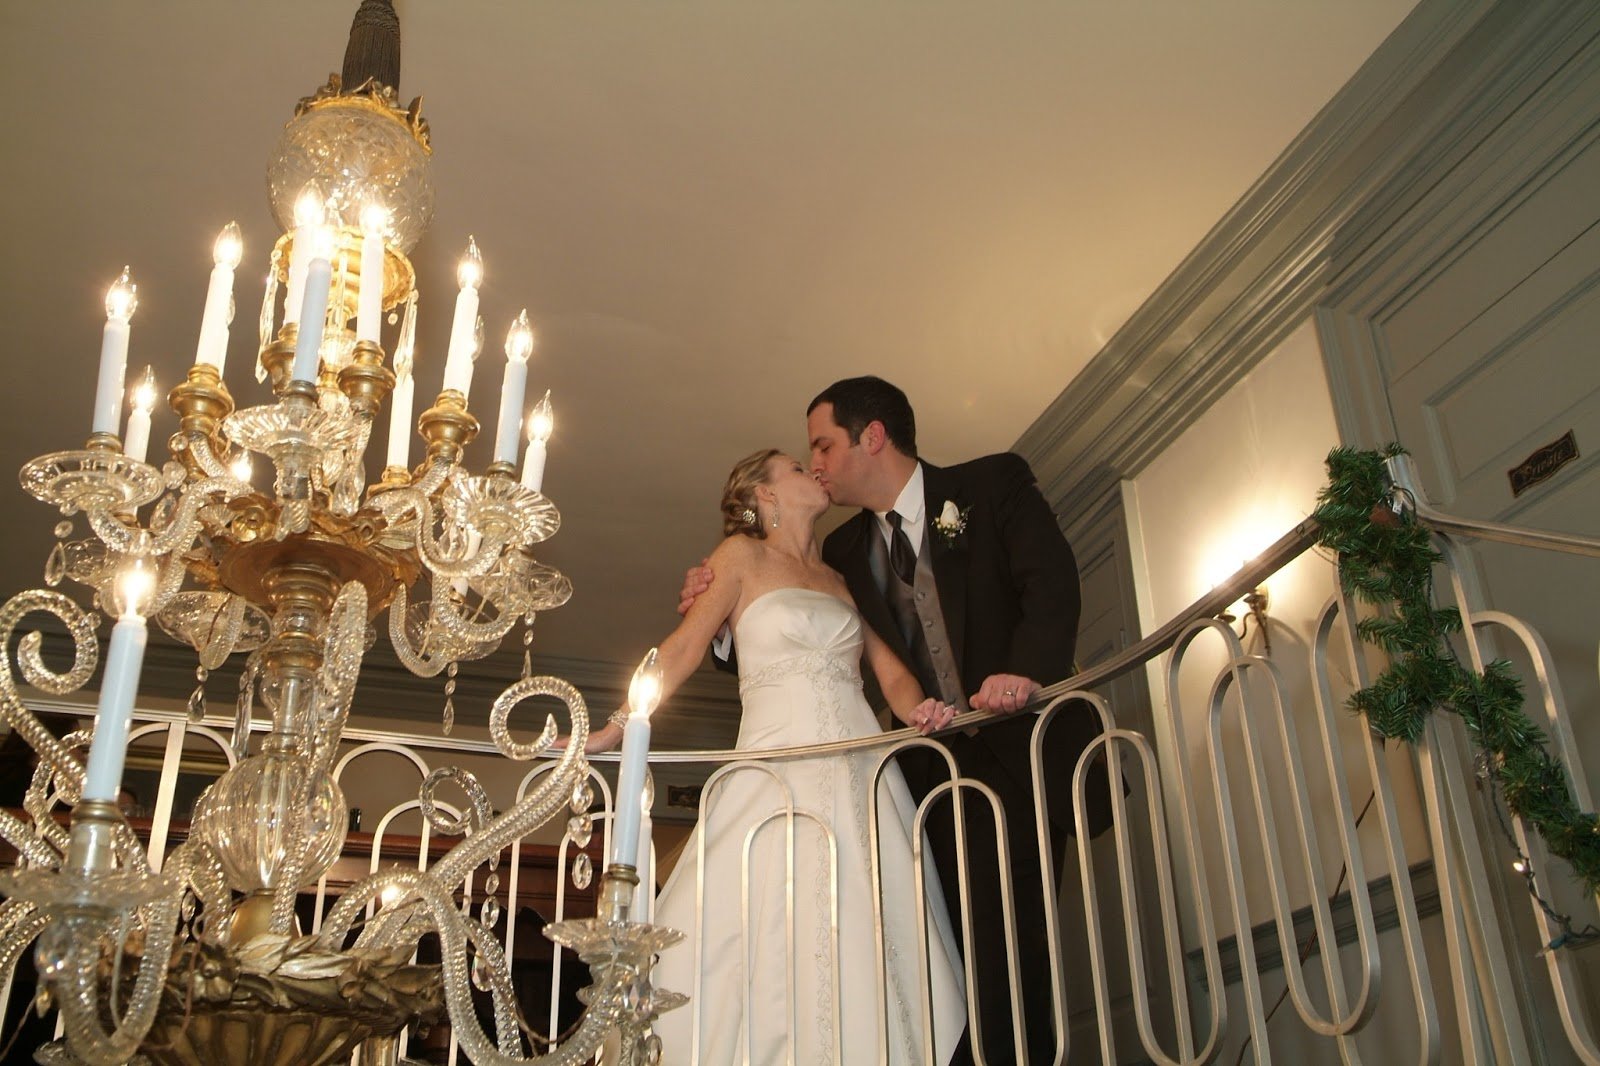 anniversary, Simply Lulu Style, Simply Lulu Design, LosPhoto, wedding, winter wedding, snow wedding